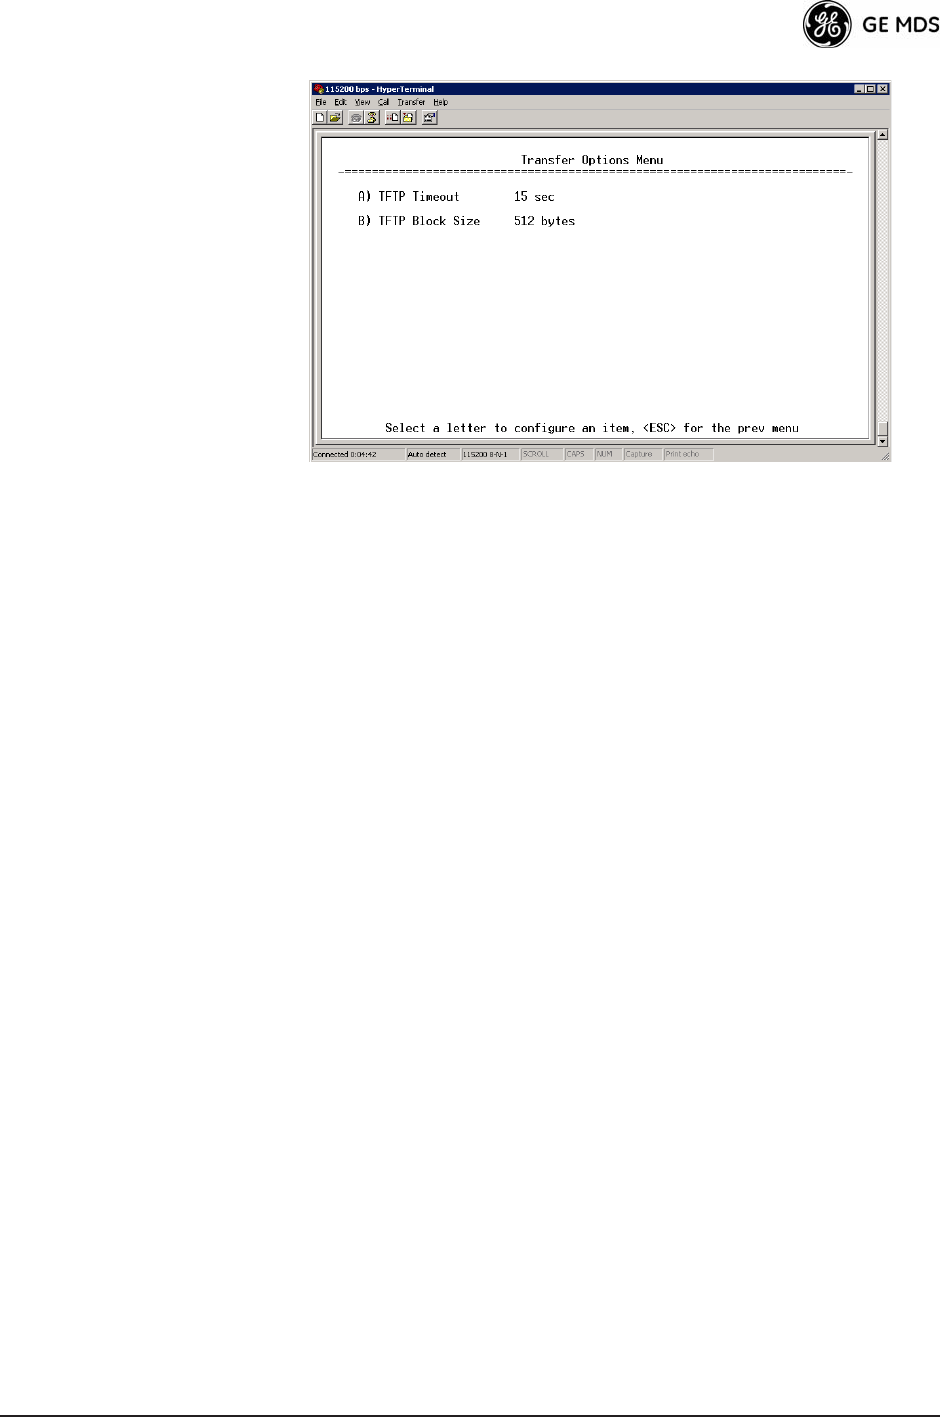 GE MDS DS-MERCURY3650 Wireless IP/Ethernet Transceiver User